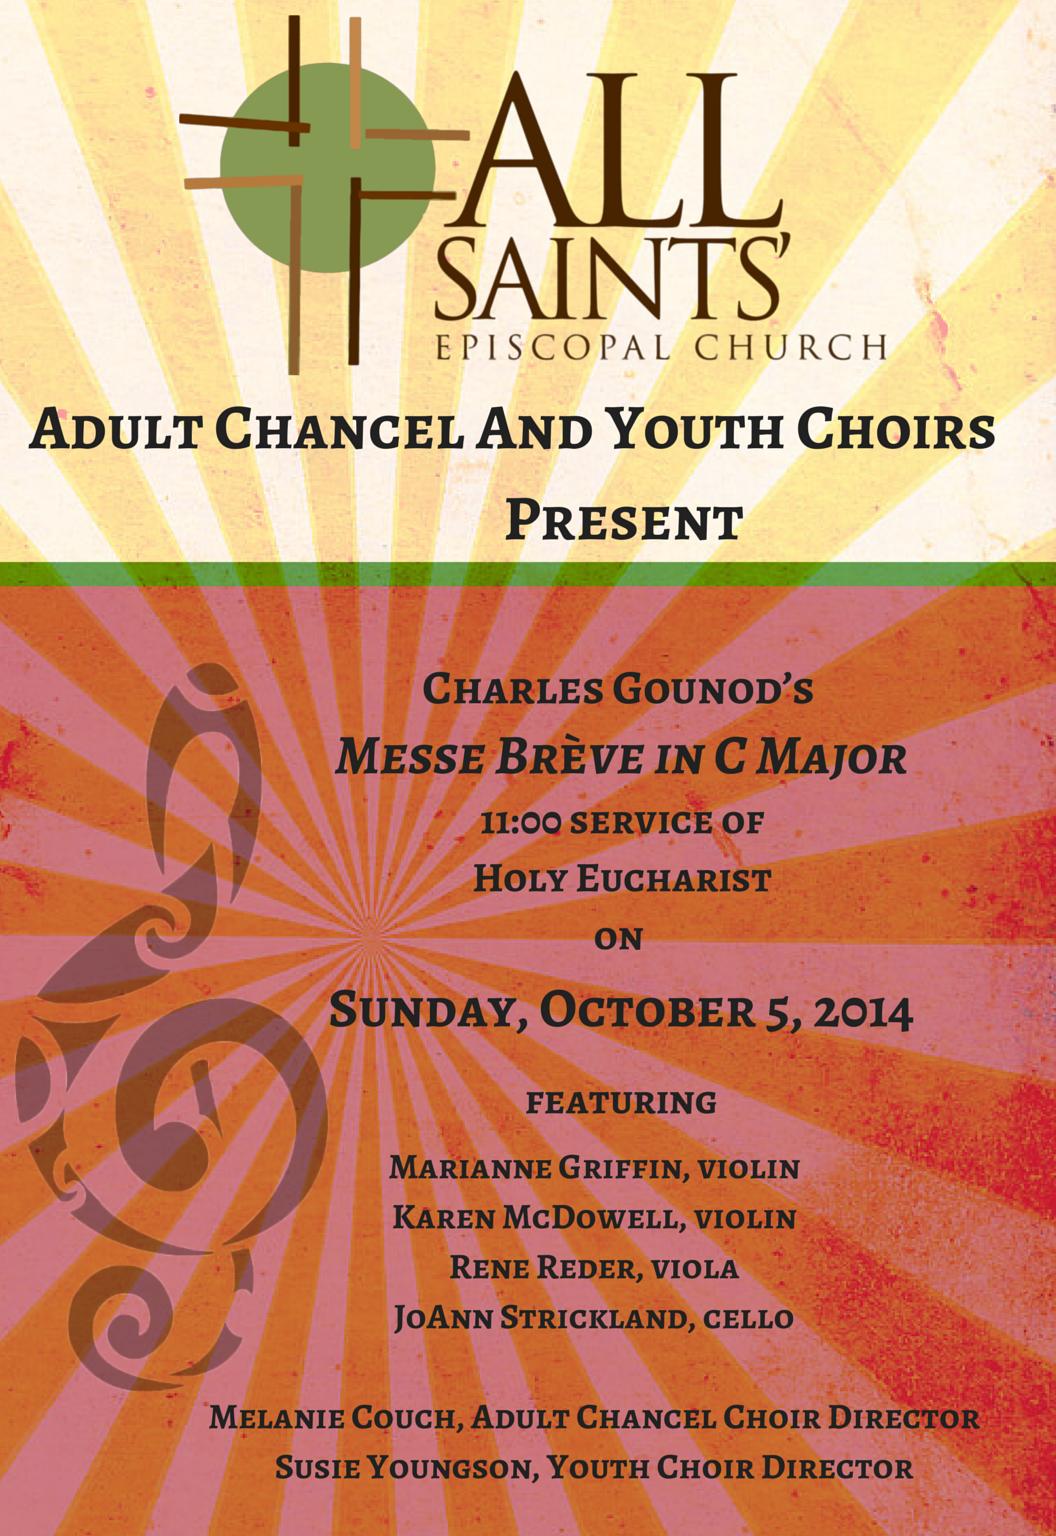 All Saints' Adult Chancel.png